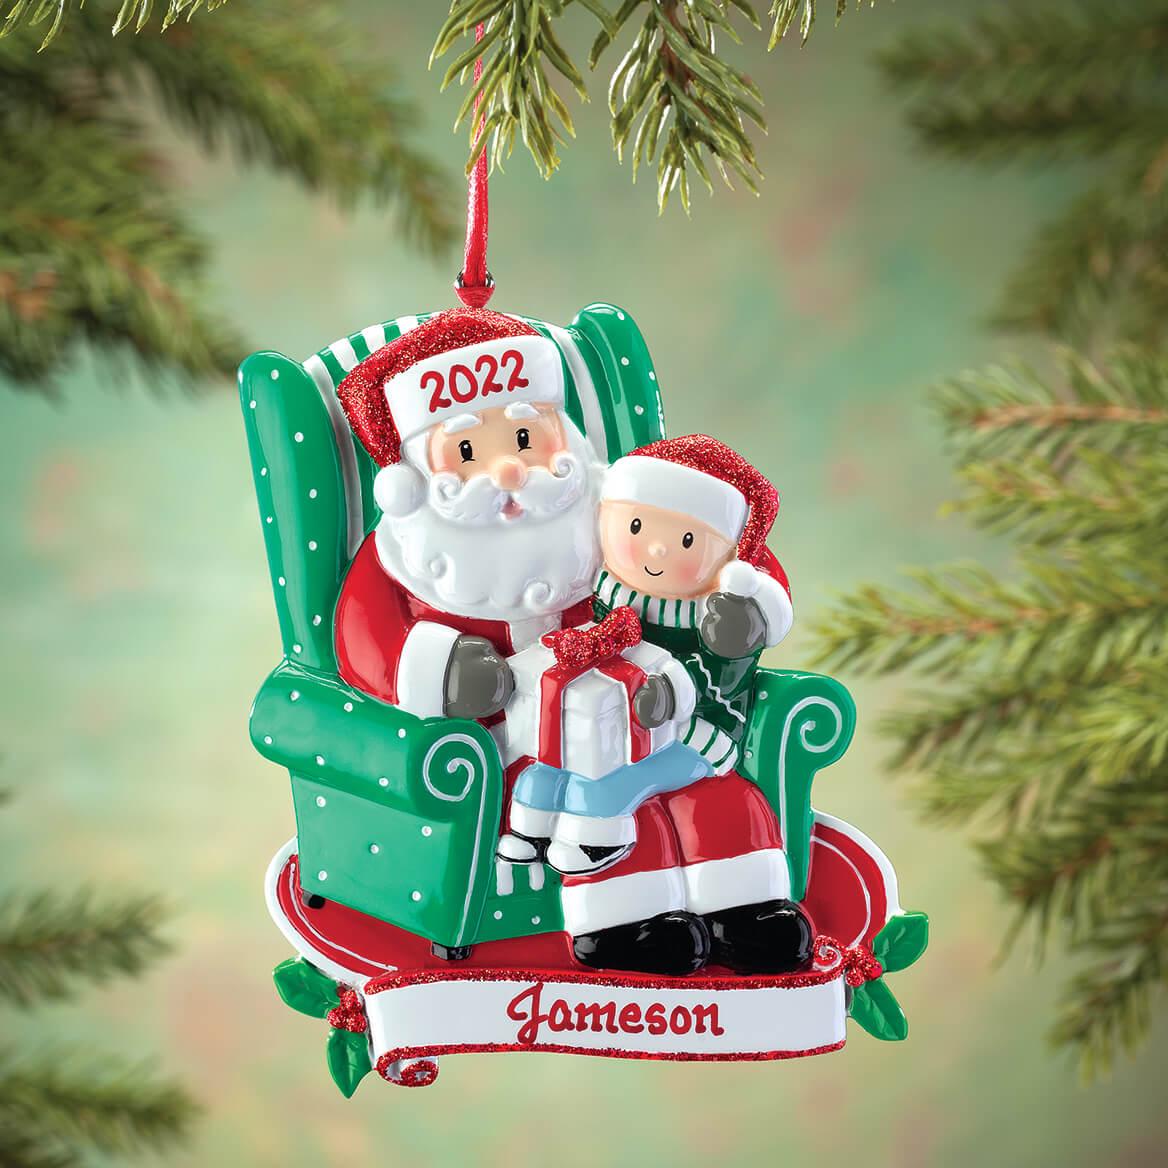 Personalized Santa and Child Ornament-364881